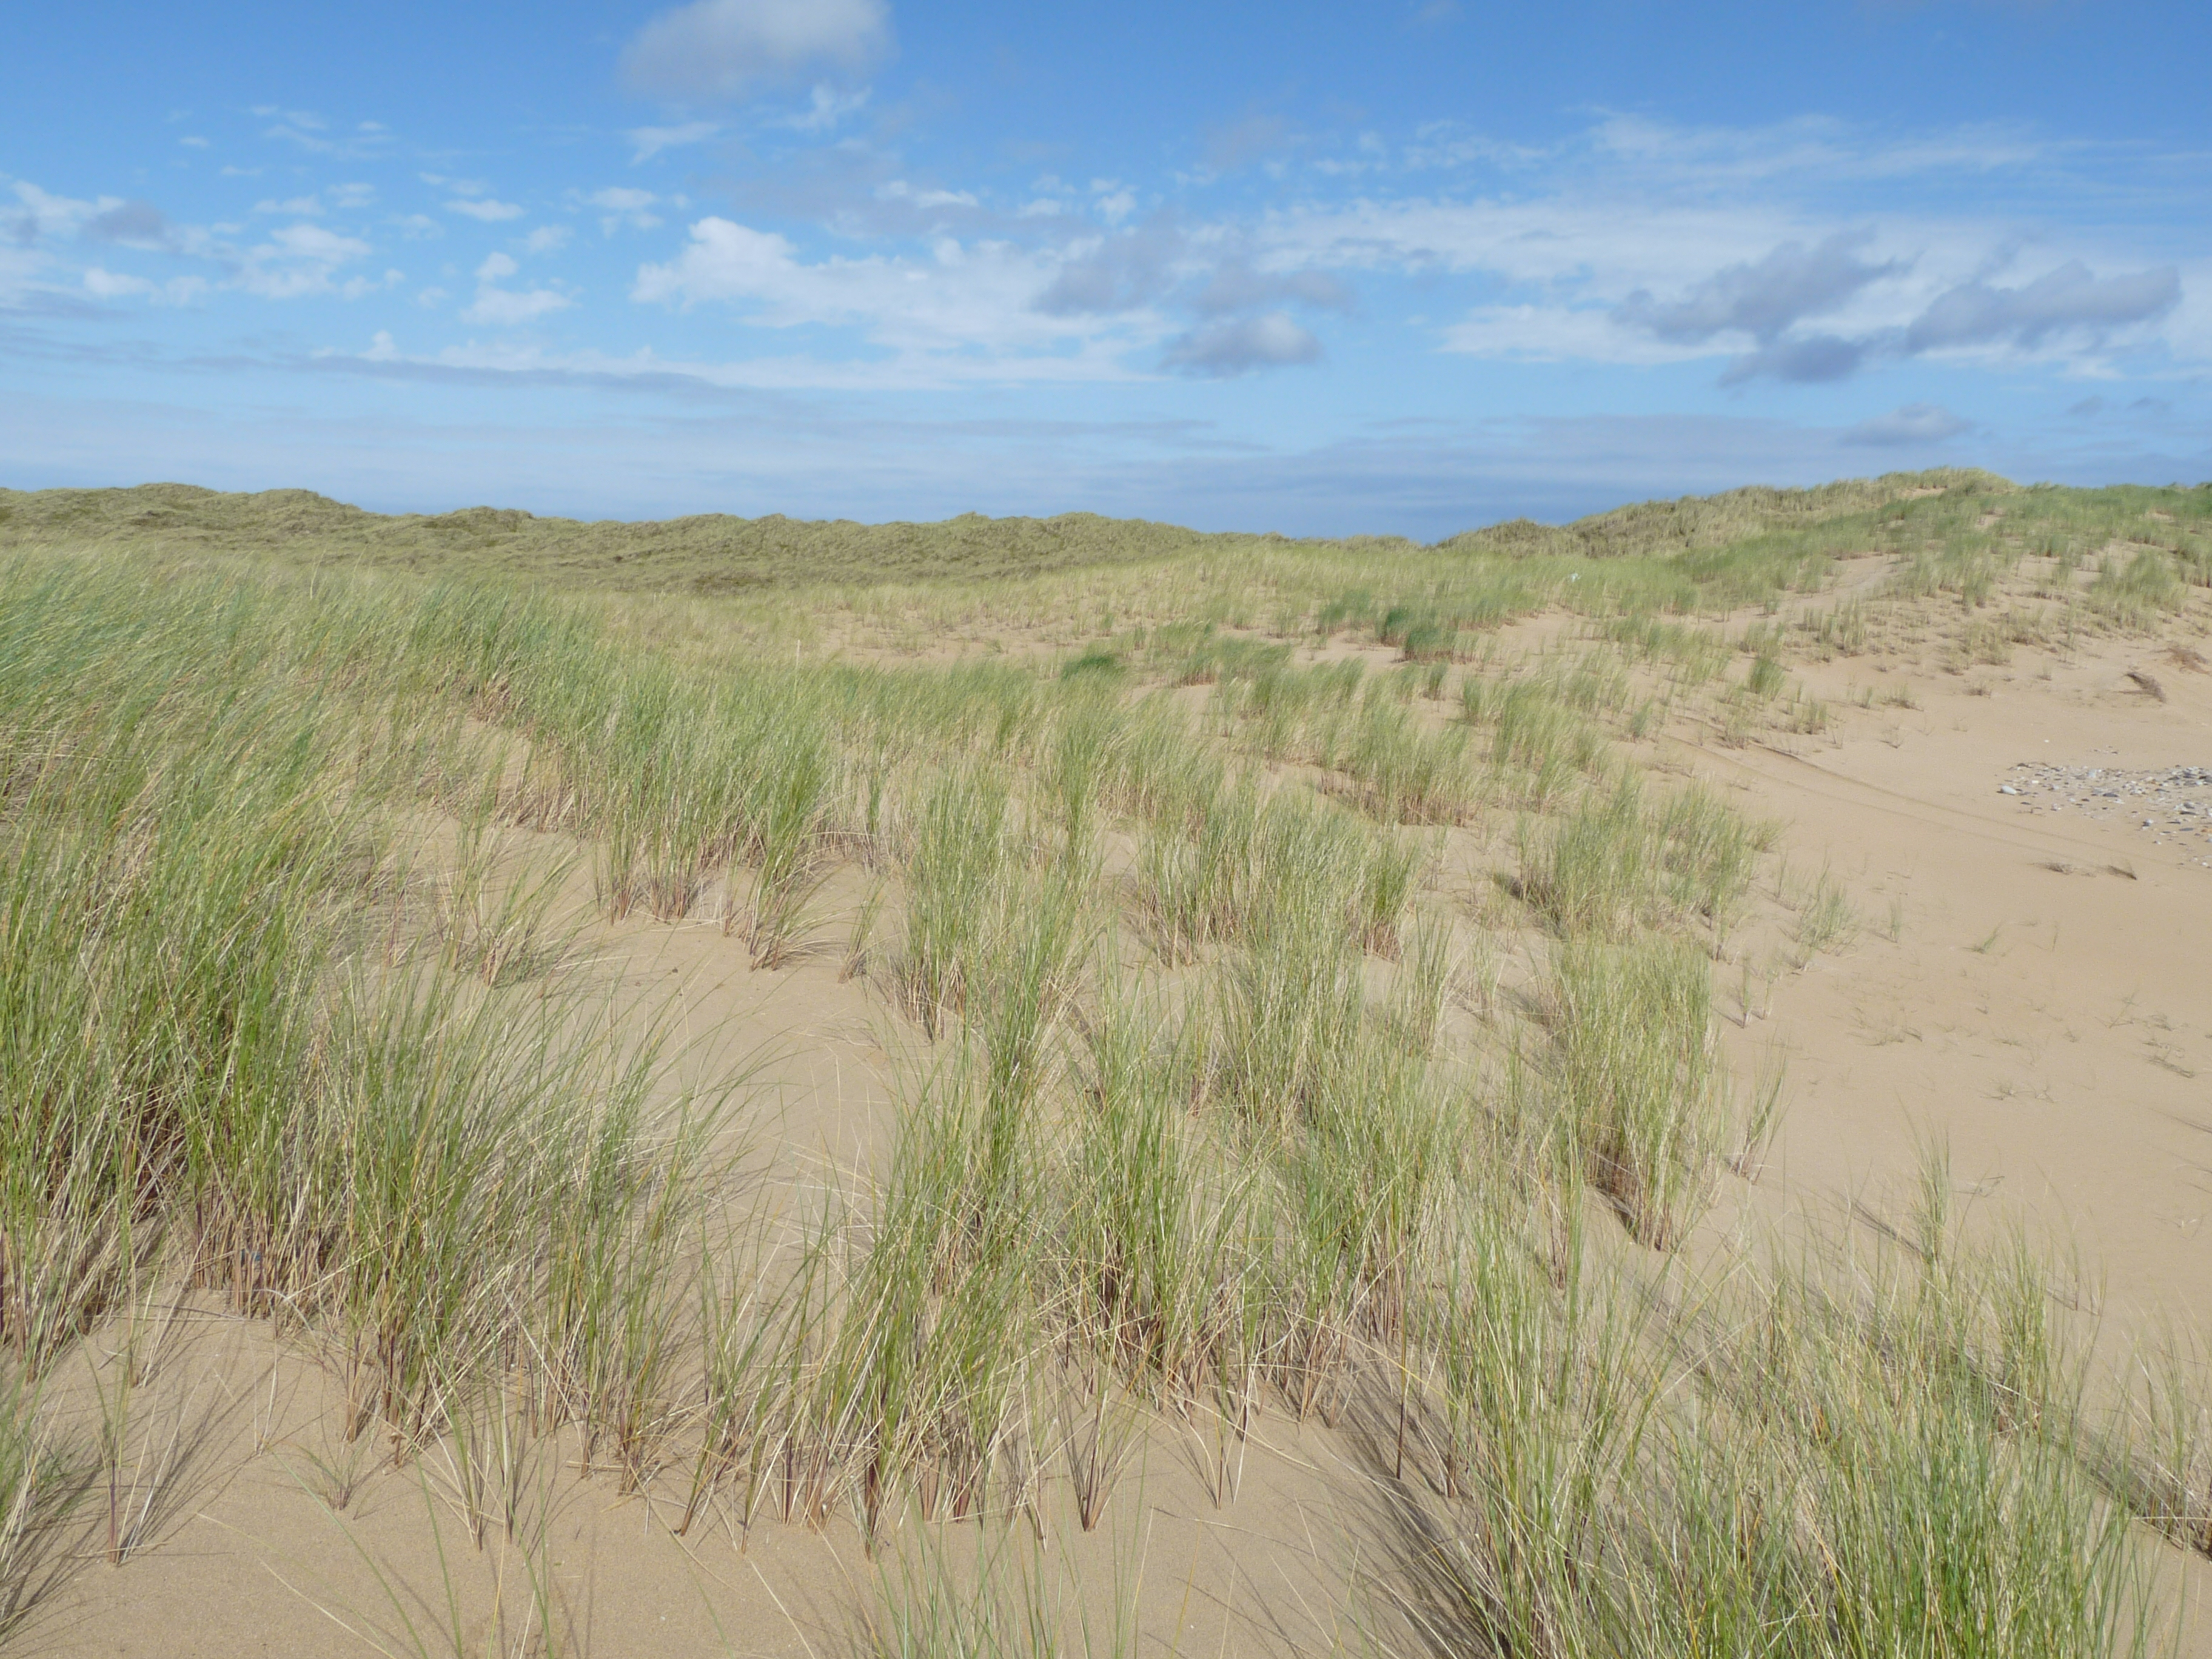 Sand Dune Monitoring Survey | BEC Consultants